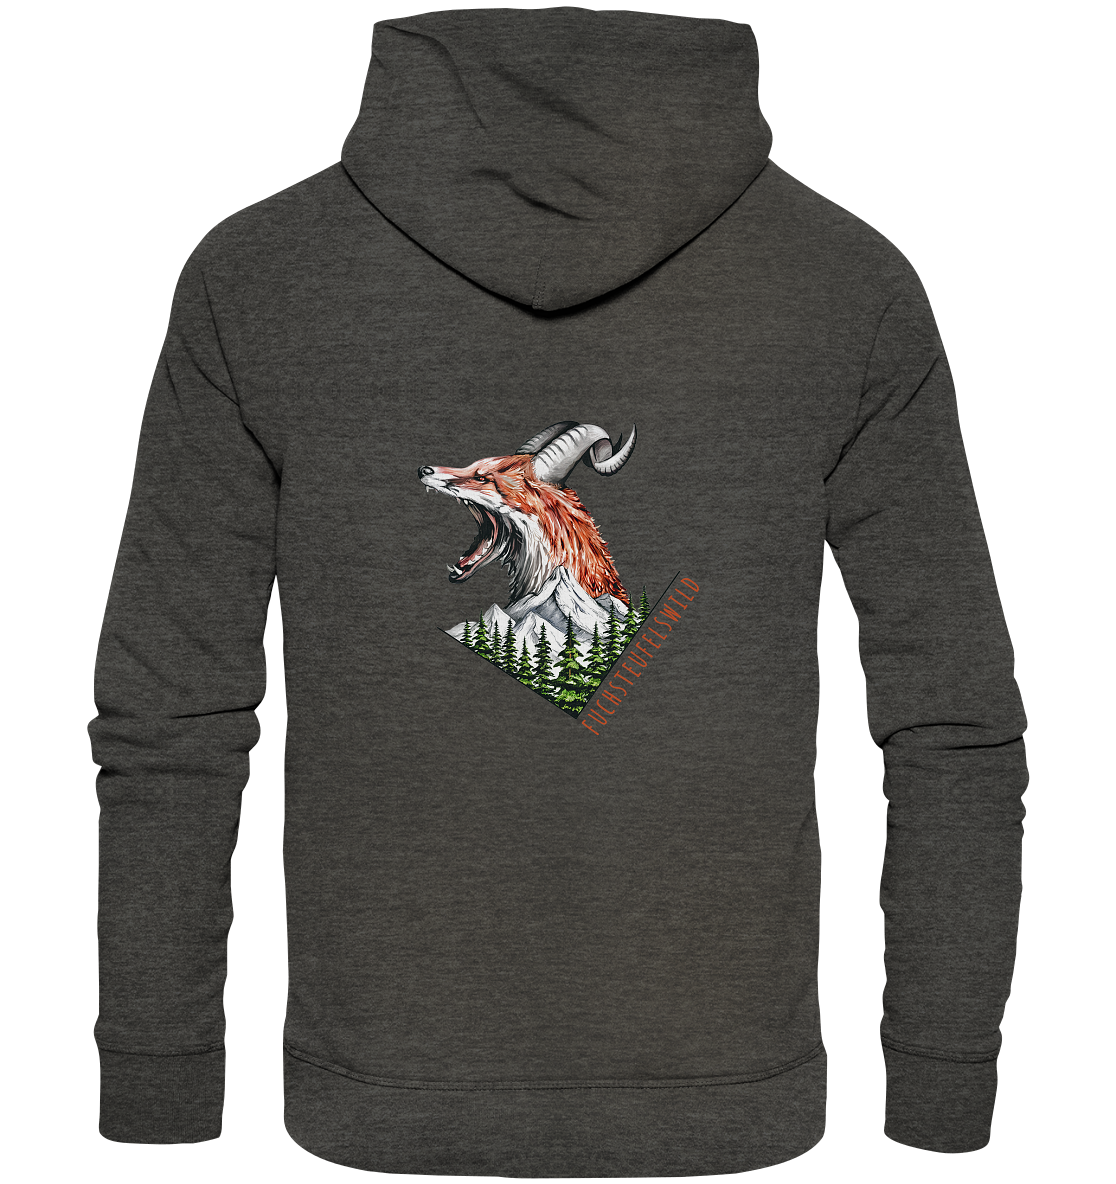 back-organic-fashion-hoodie-252625-1116x-1.png